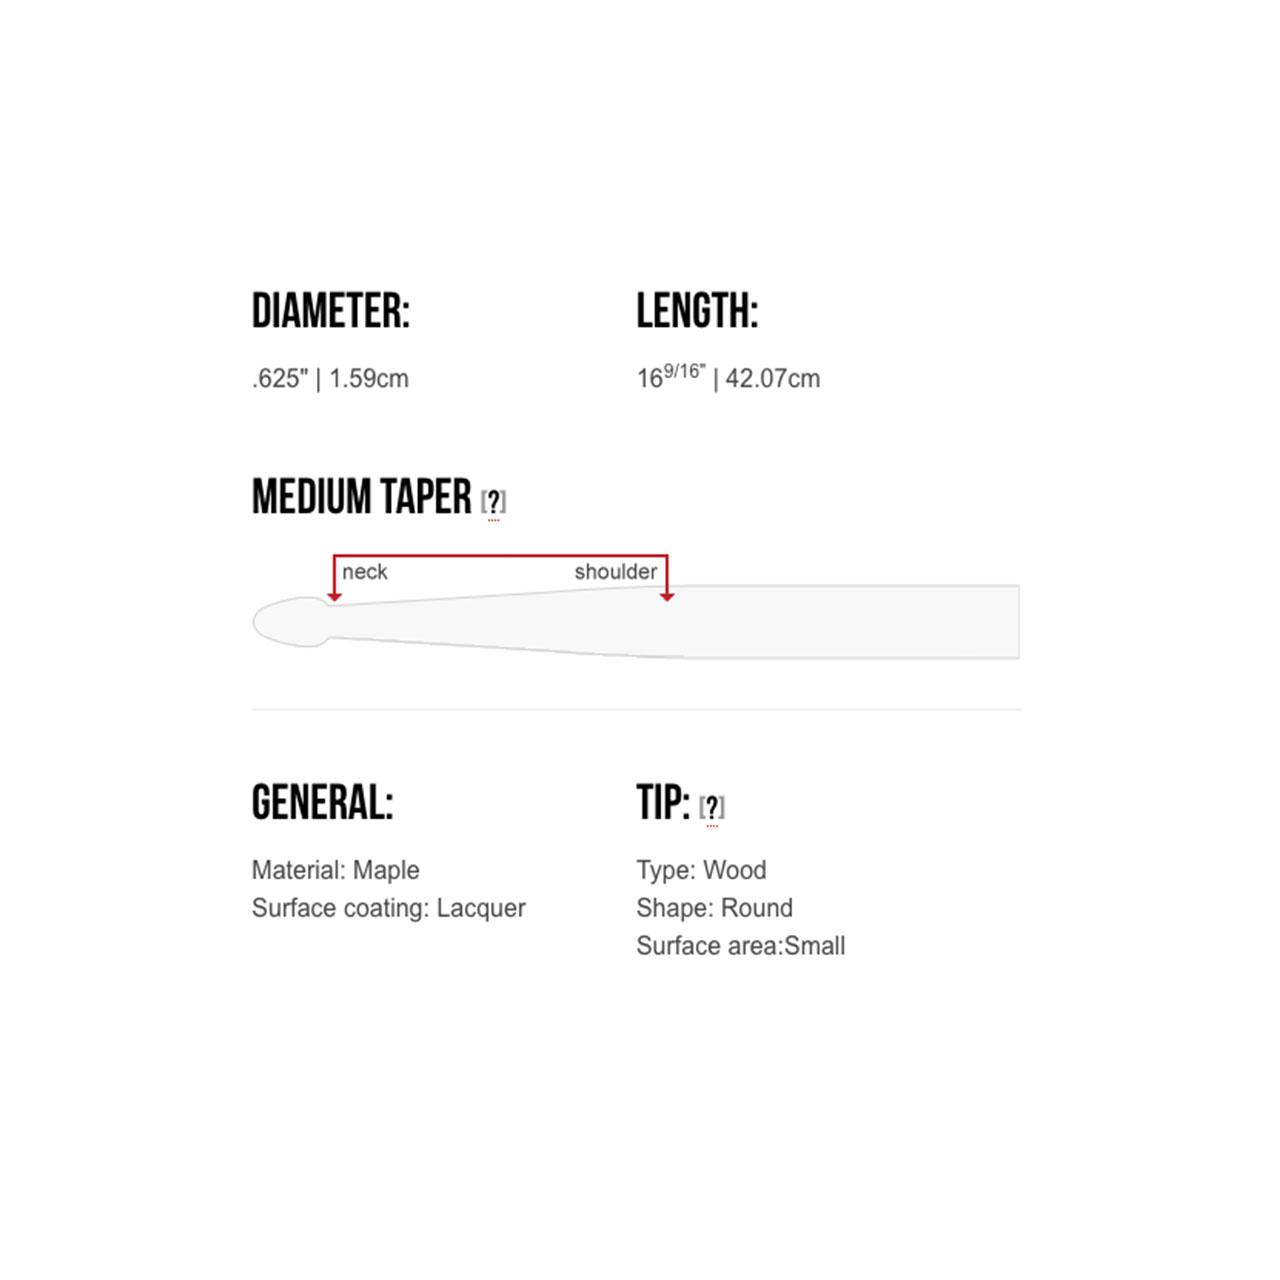 Baqueta Signature Tom Gauger TG15 Tenor Caixa Sinfônica